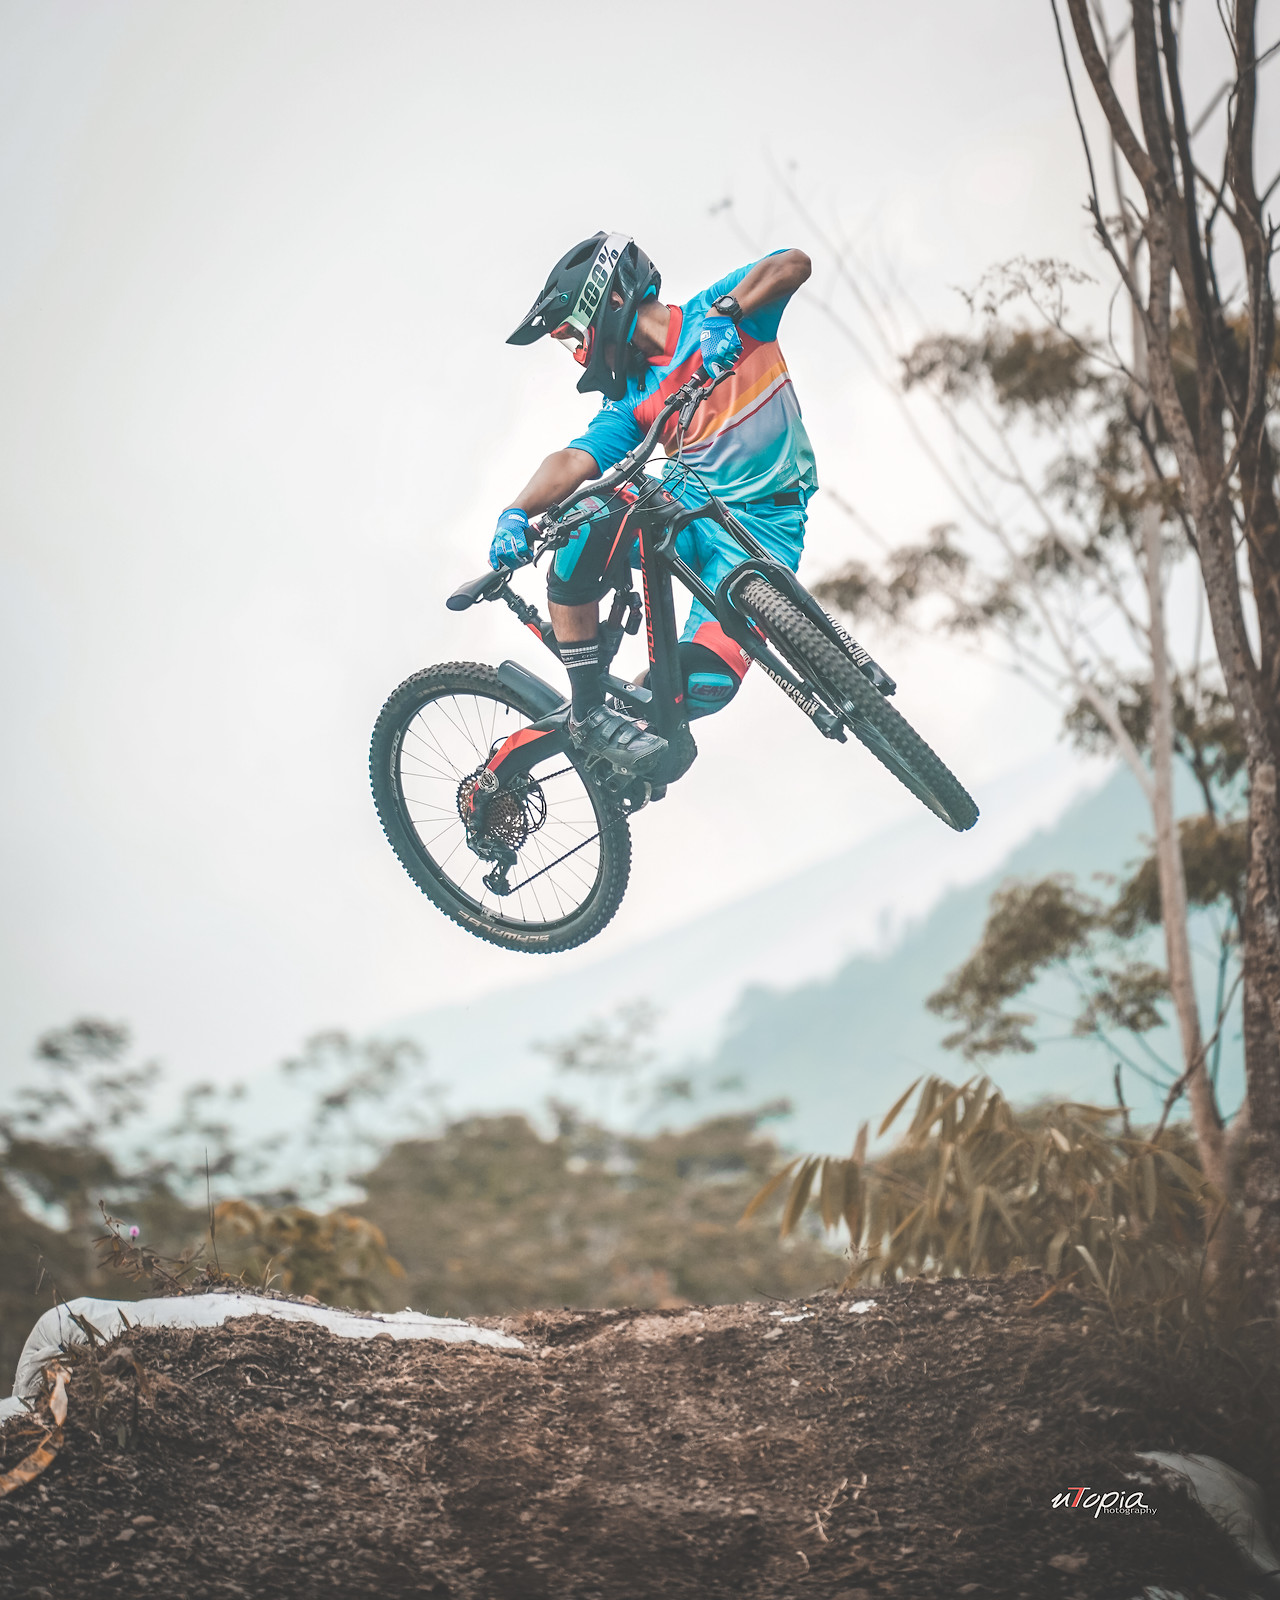 Checking Rear Tire - utopiaarch - Mountain Biking Pictures - Vital MTB